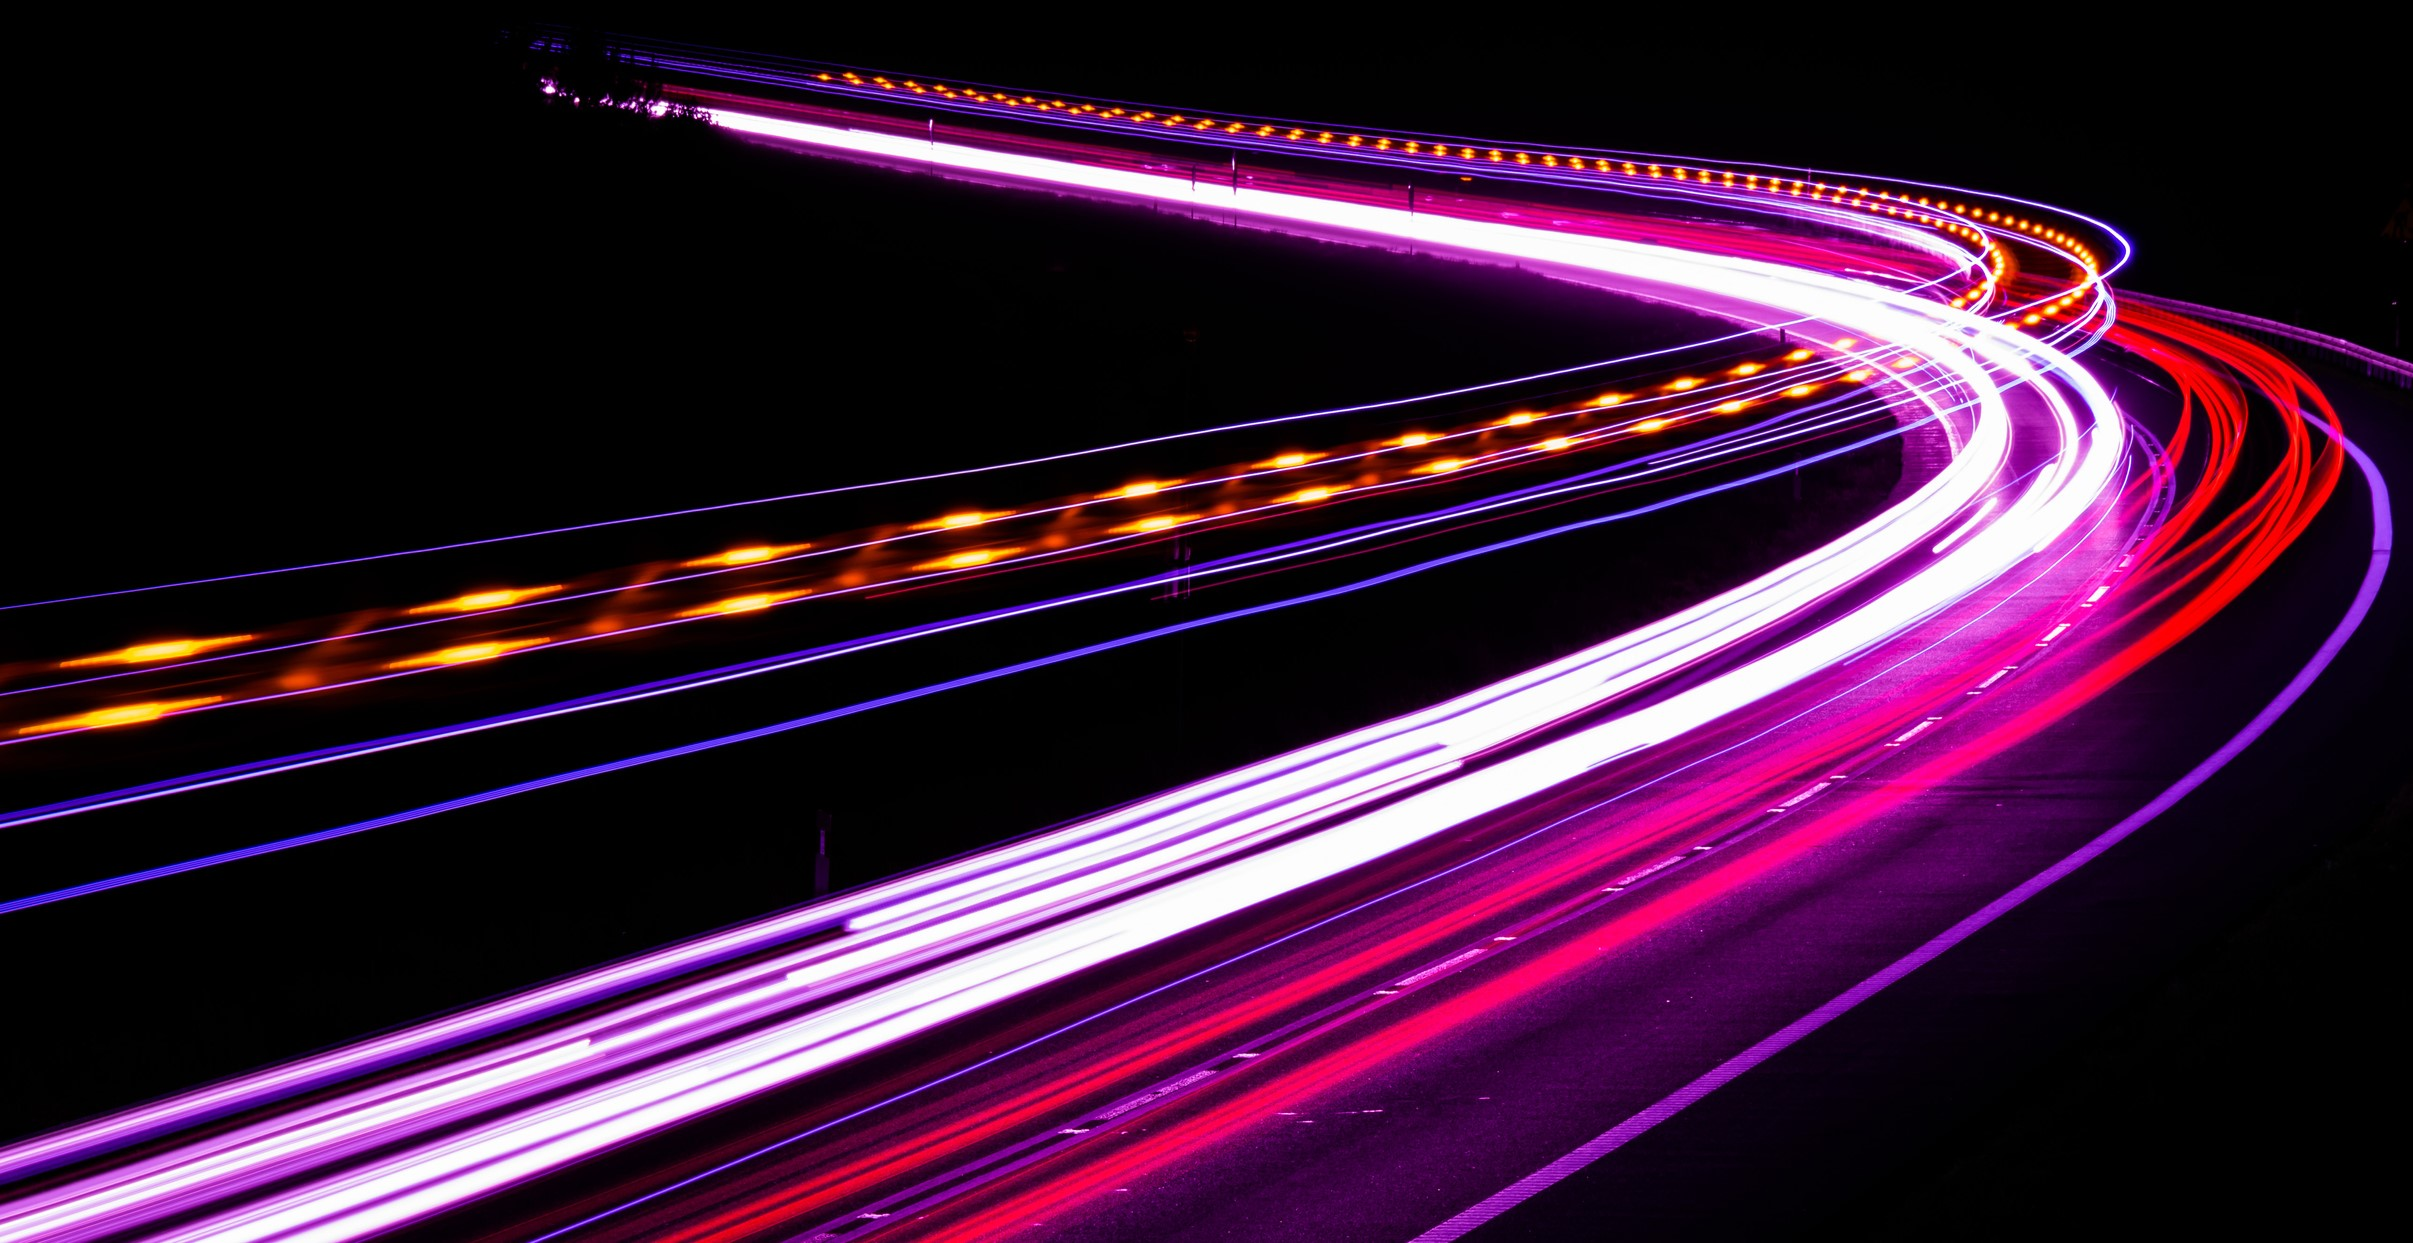 Car lights at night - purple shades